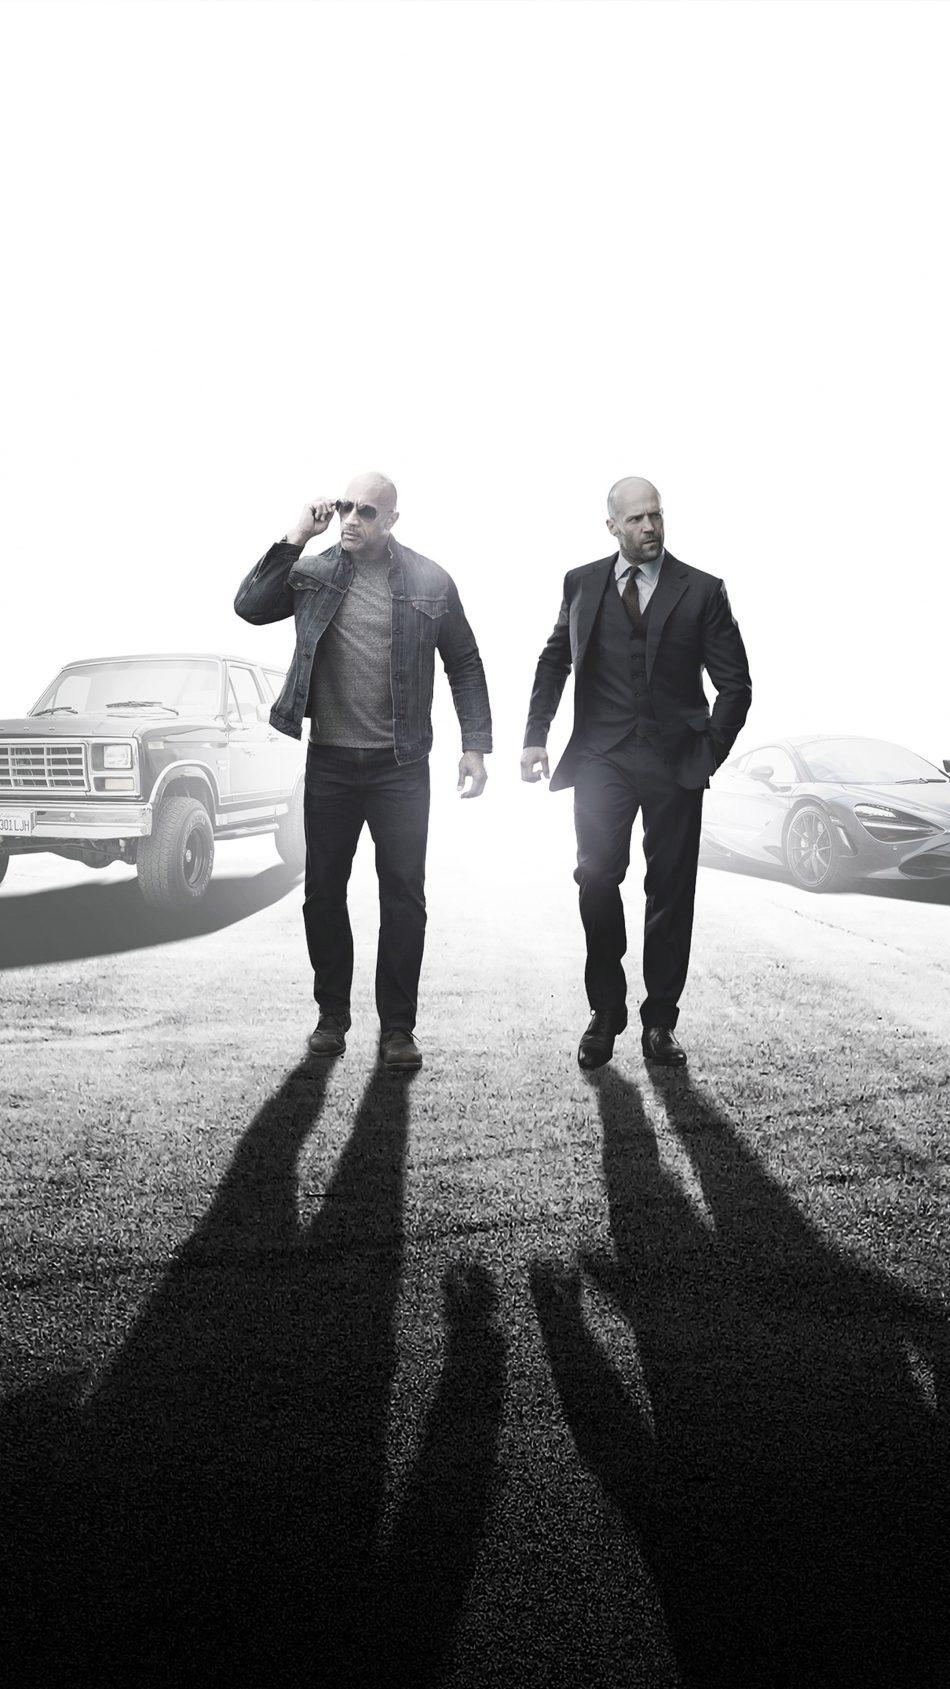 Dwayne johnson & Jason In Fast & Furious Presents - Hobbs & Shaw 4K Ultra HD Mobile Wallpaper